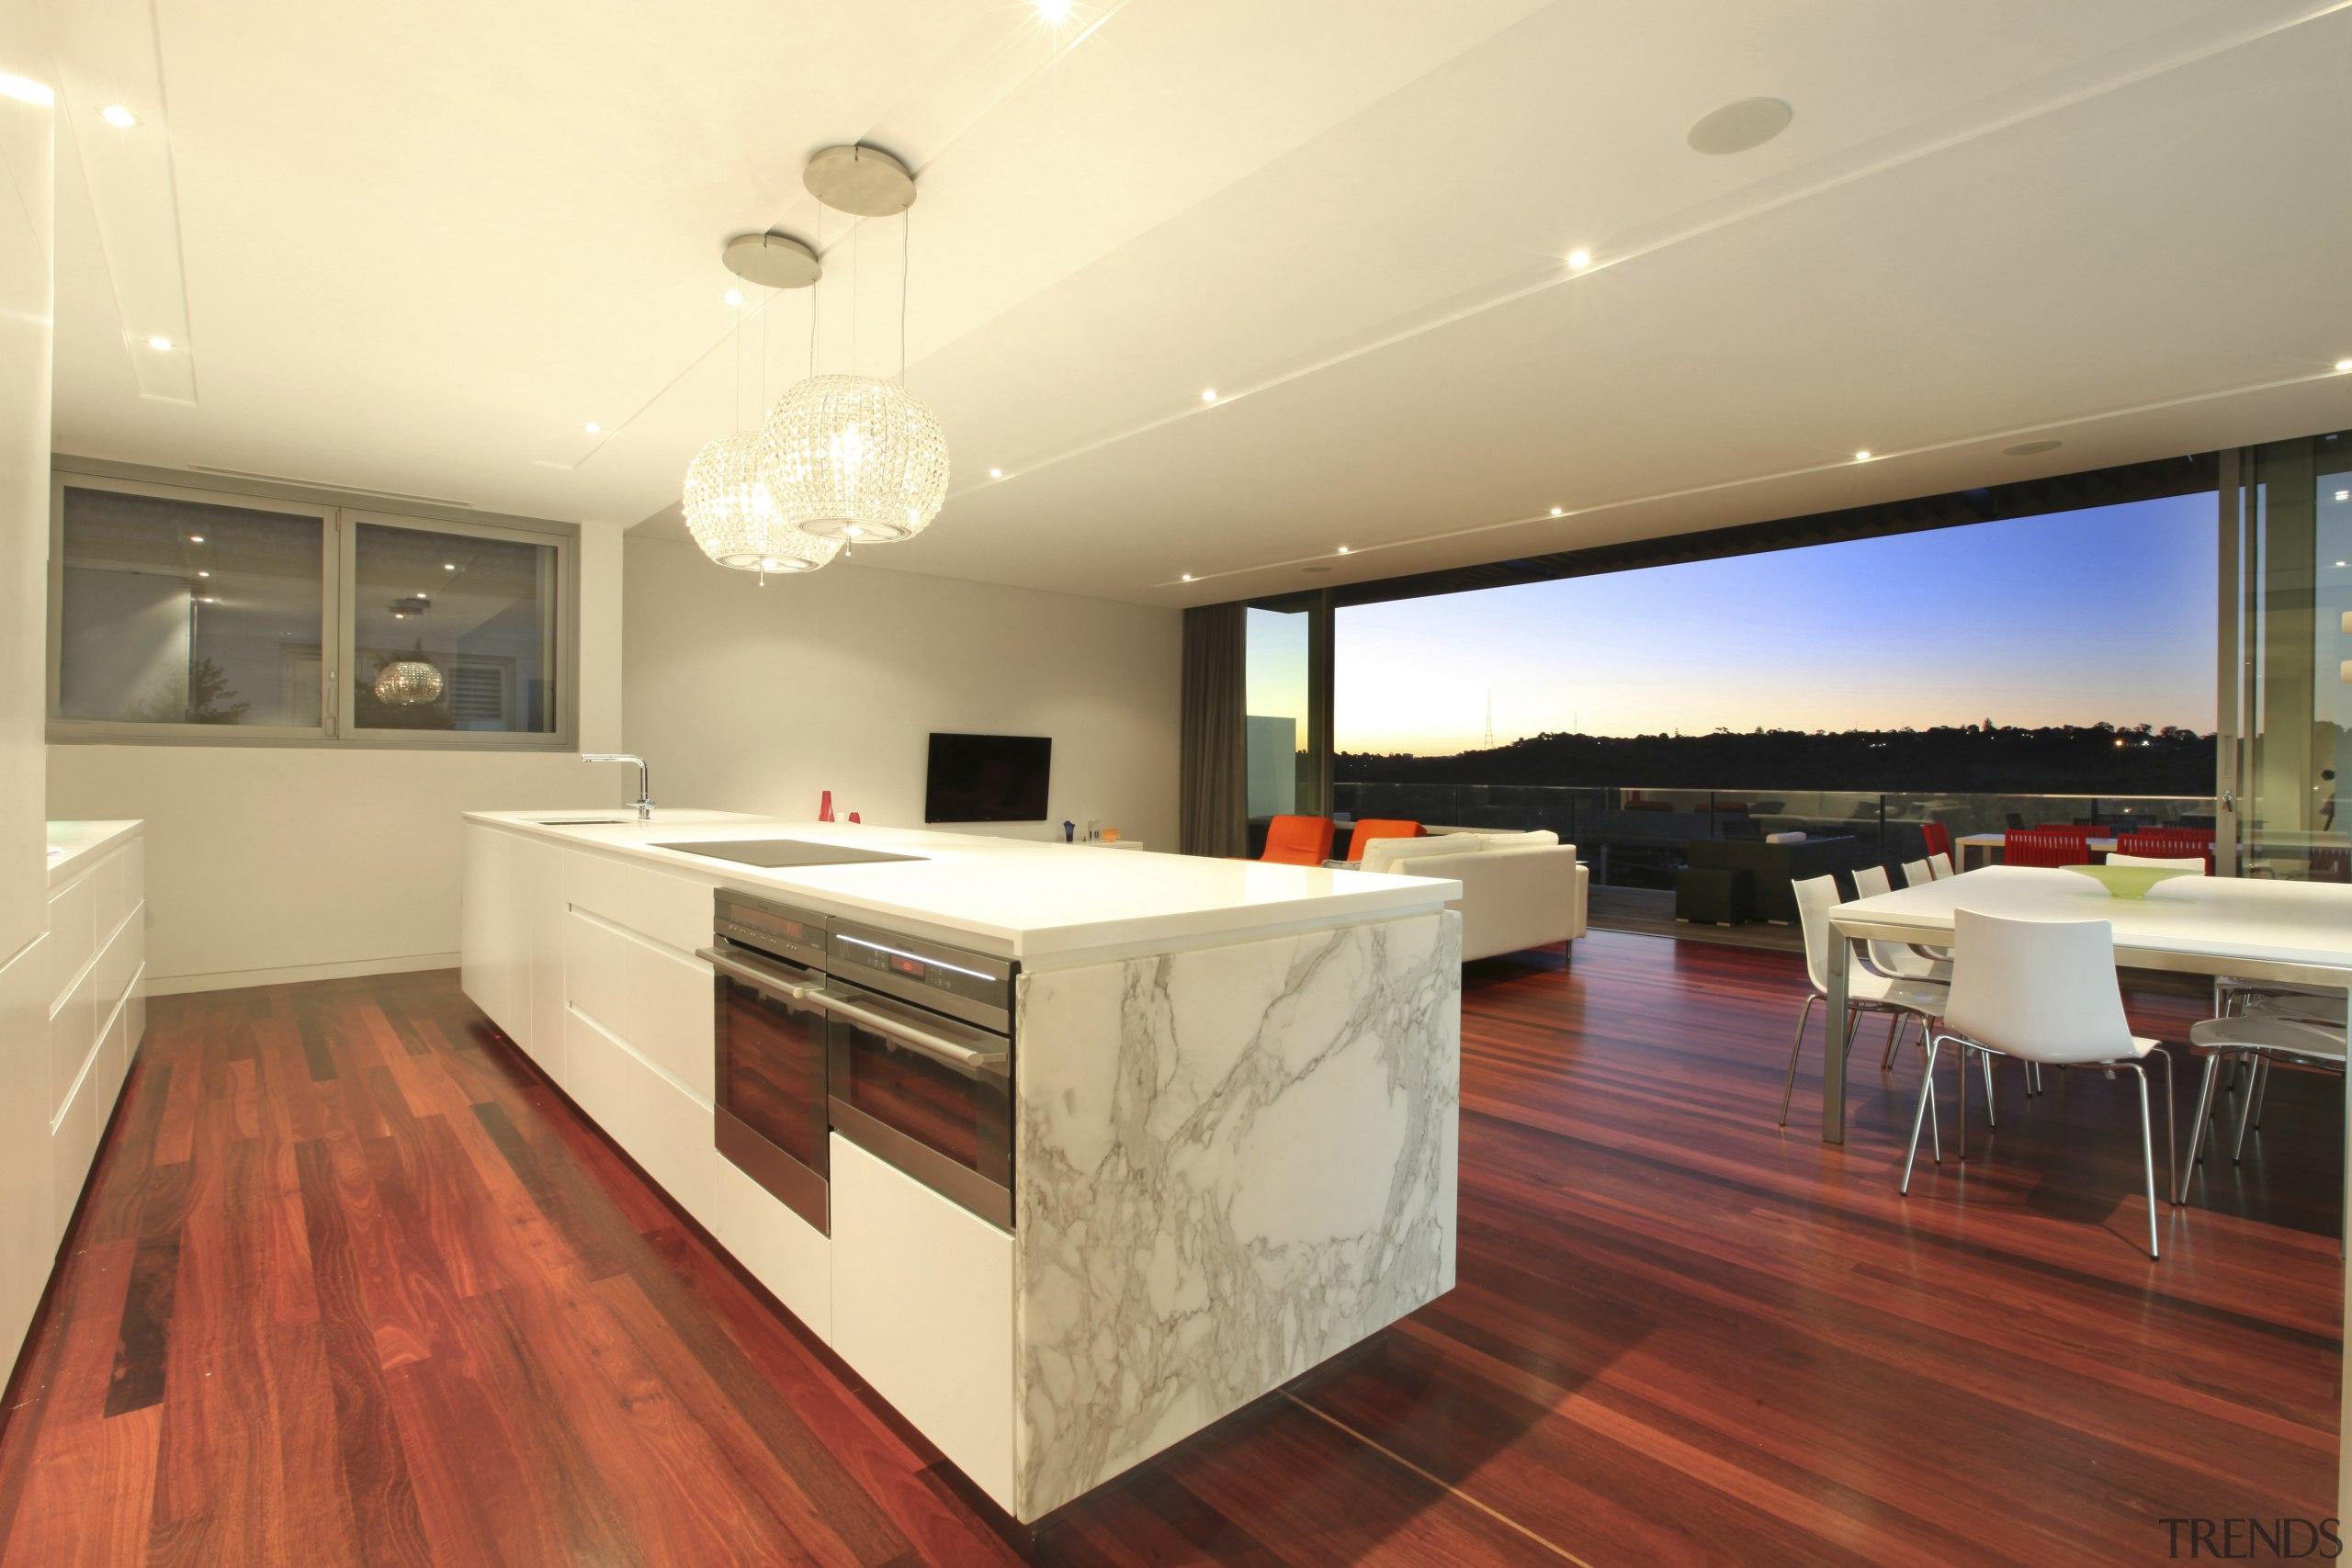 Kitchen with marble island top and wooden flooring. architecture, ceiling, countertop, floor, flooring, hardwood, interior design, kitchen, real estate, wood flooring, orange, red